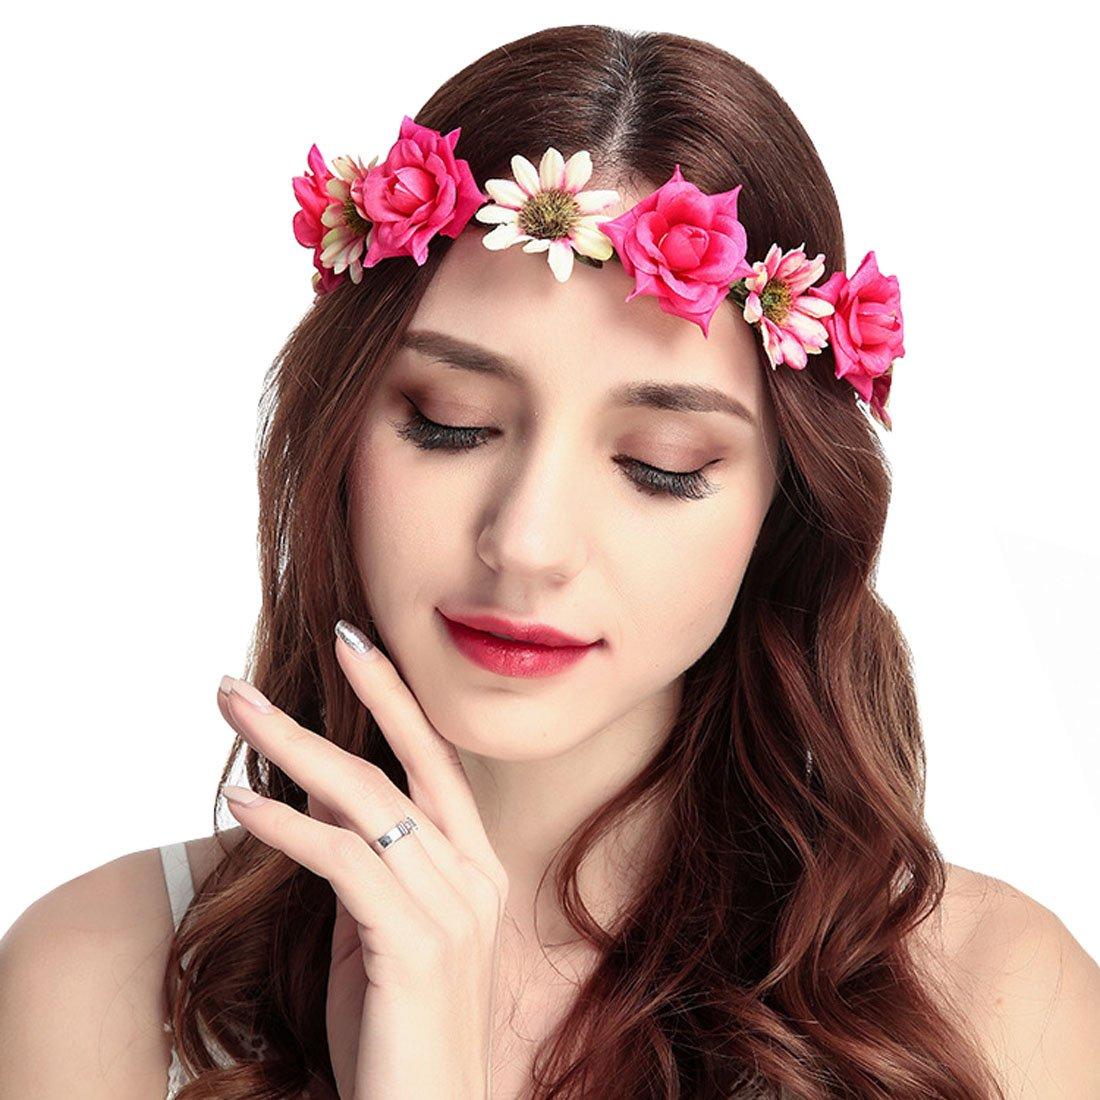 June Bloomy Rose Daisy Flower Headband Bohemia Floral Crown Headwear